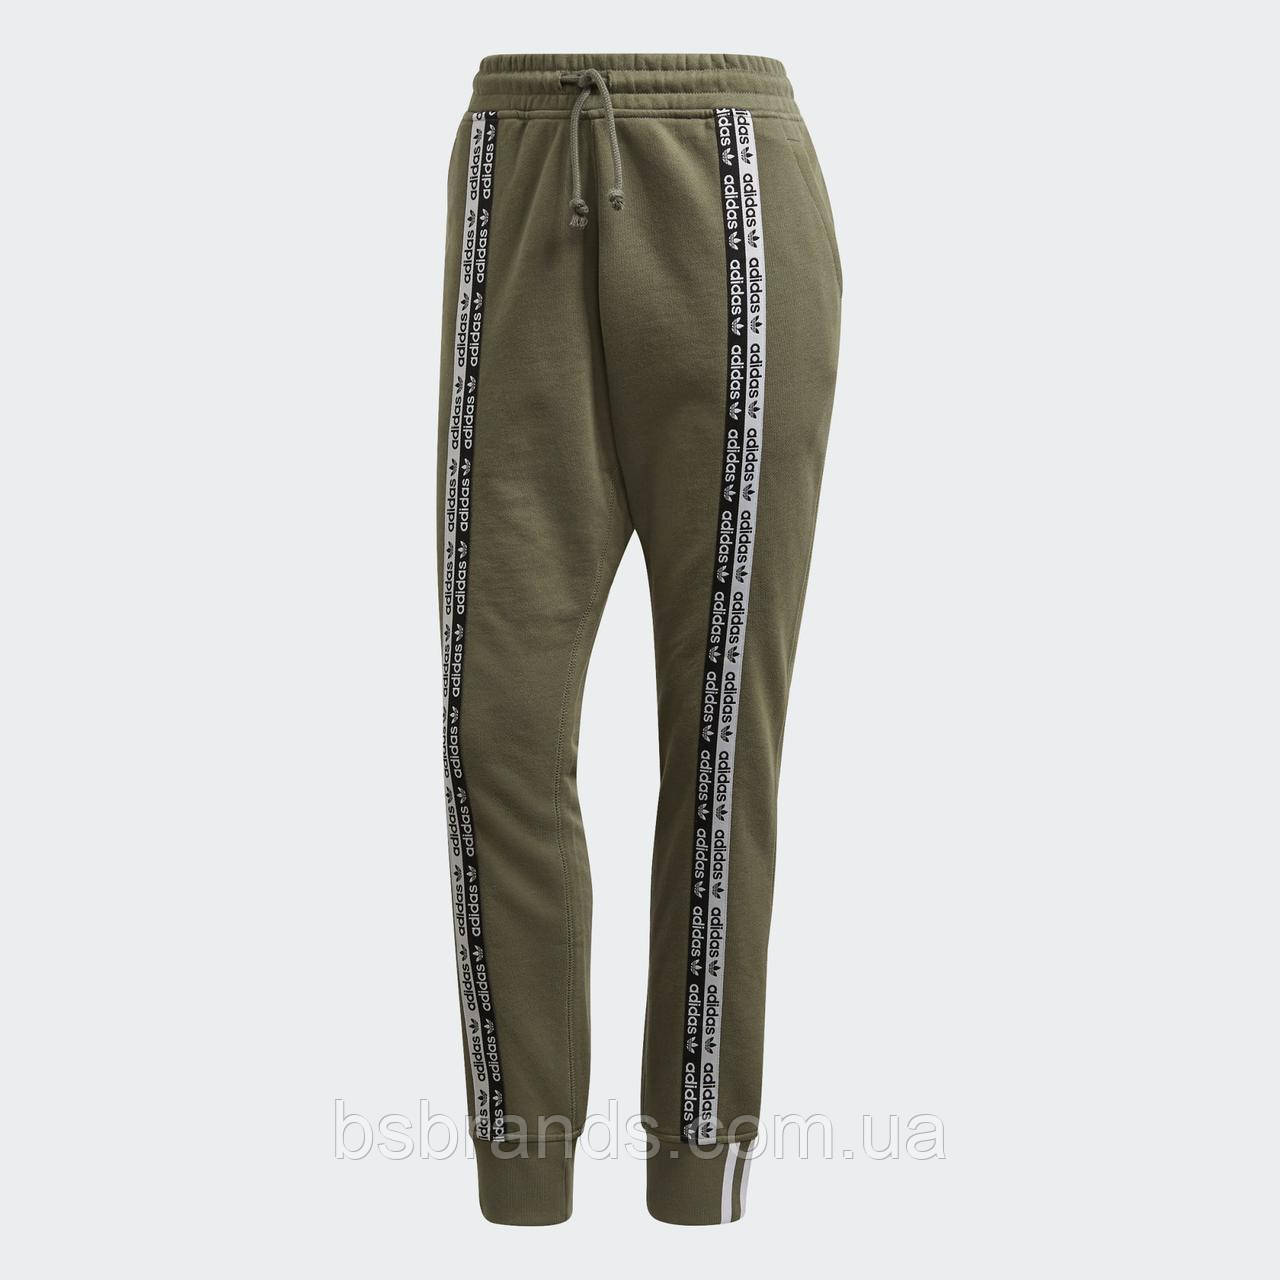 Женские штаны-джоггеры adidas R.Y.V. FM4383 (2020/1)